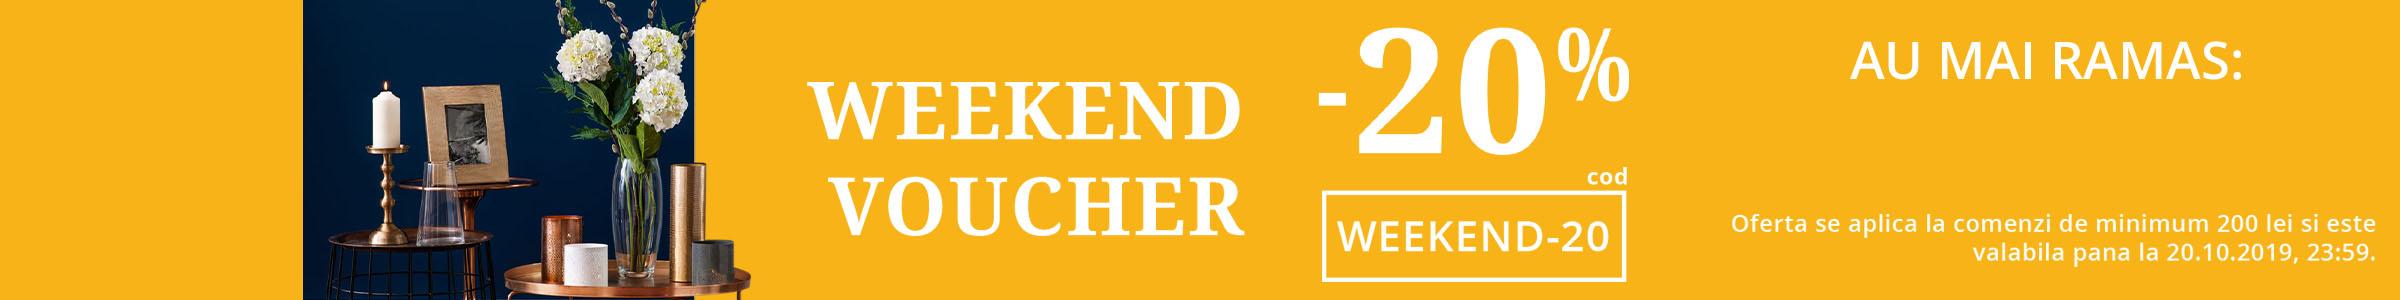 Weekend Voucher